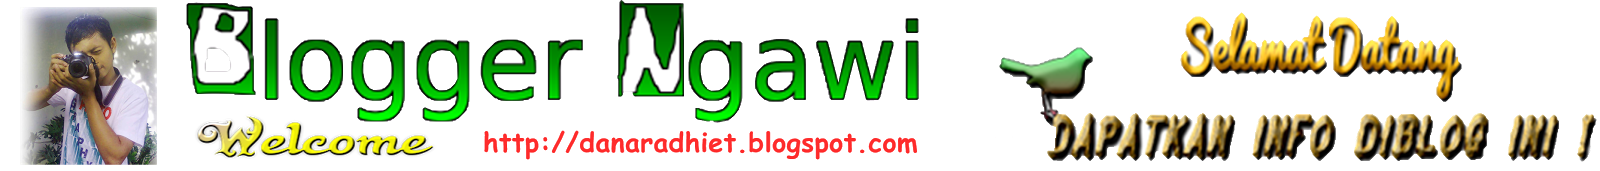 Blogger Ngawi